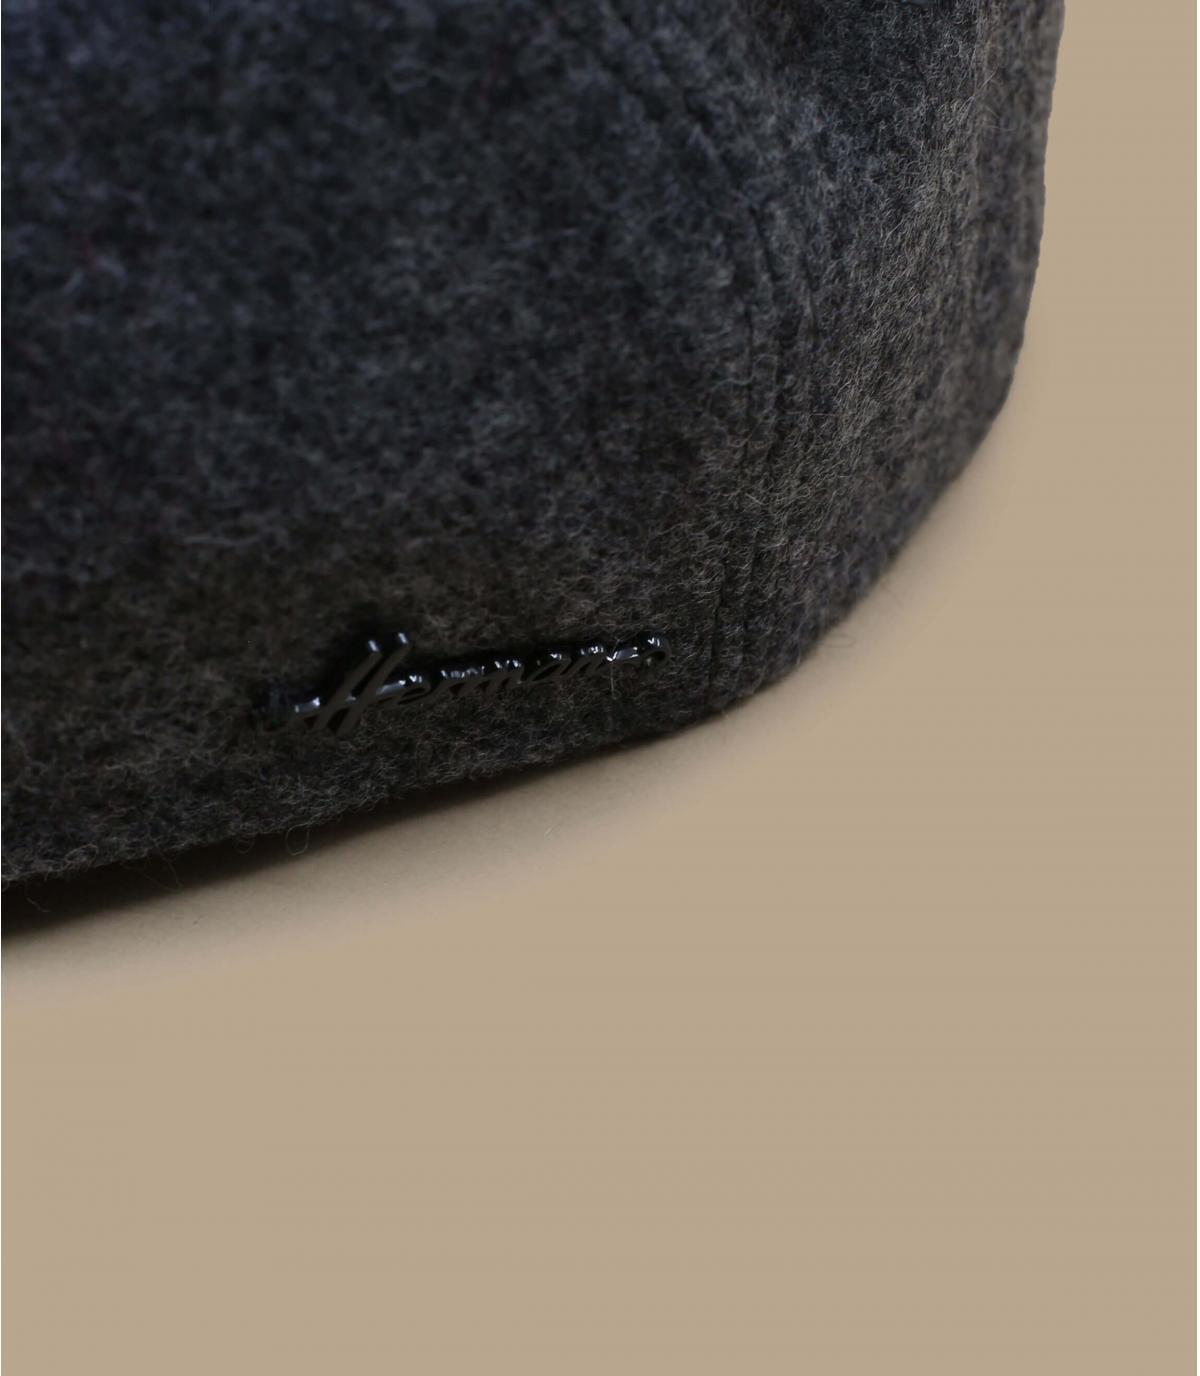 Dettagli Range wool EF grey - image 2